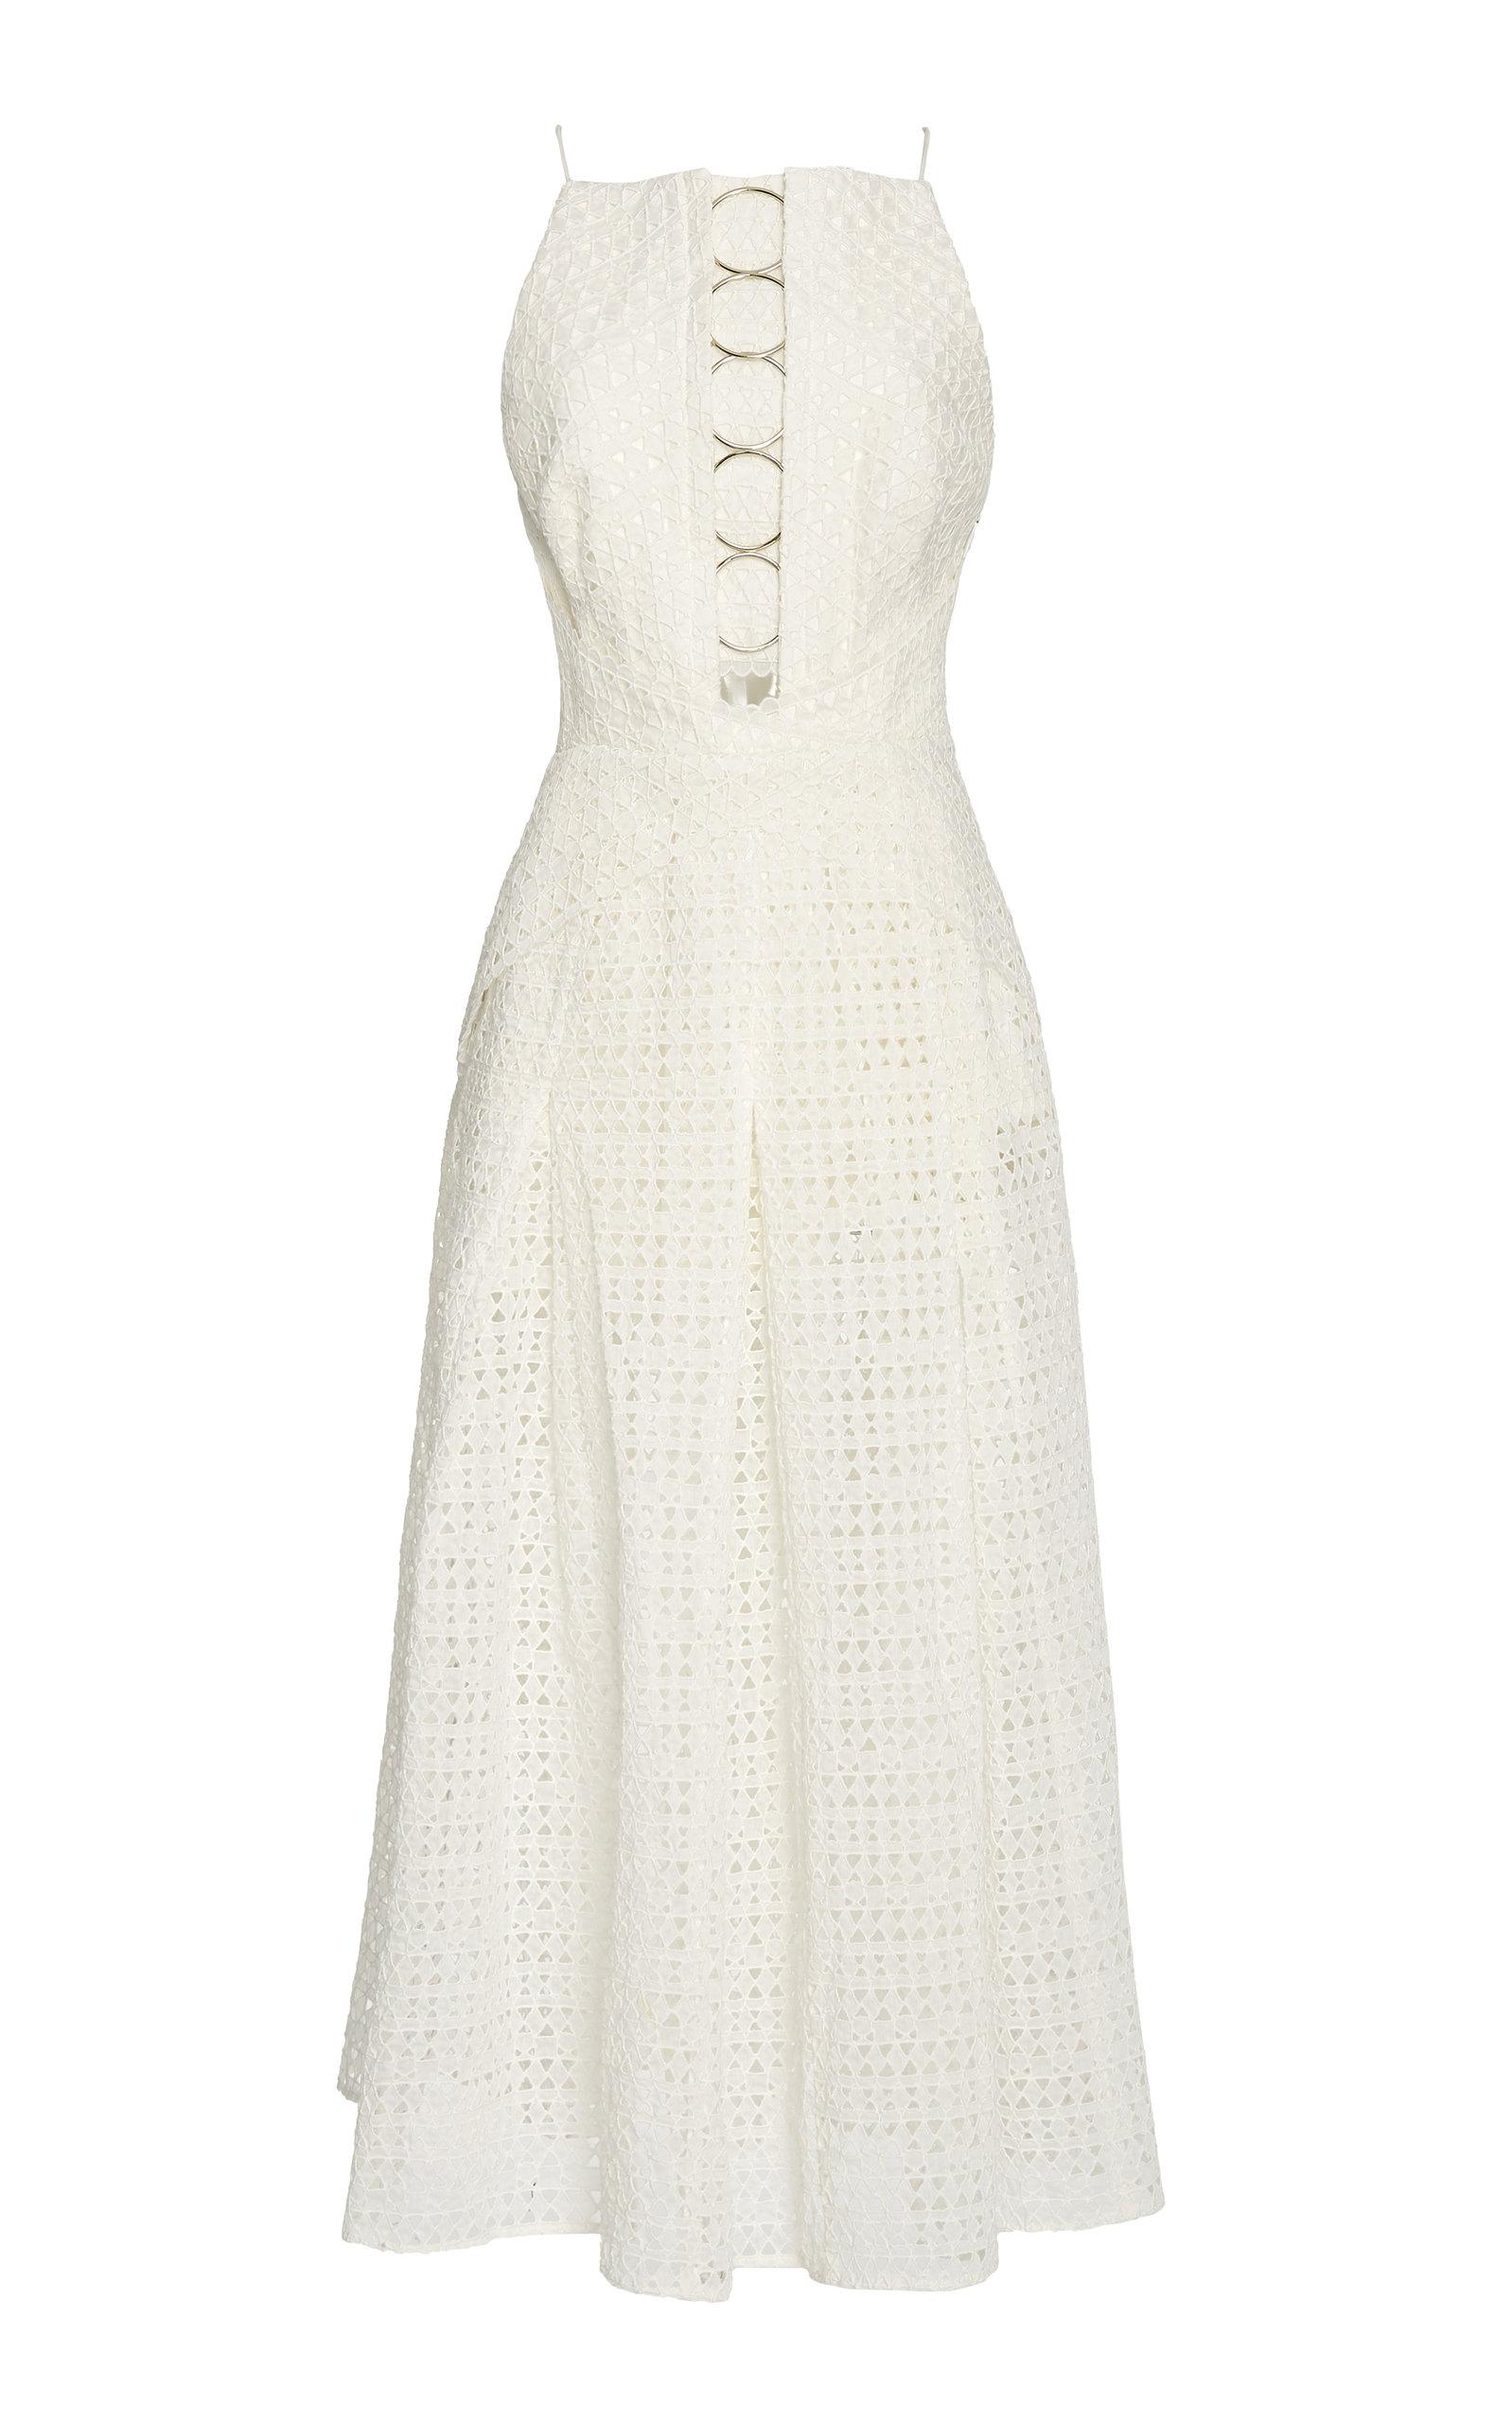 Acler Eden sleeveless maxi dress